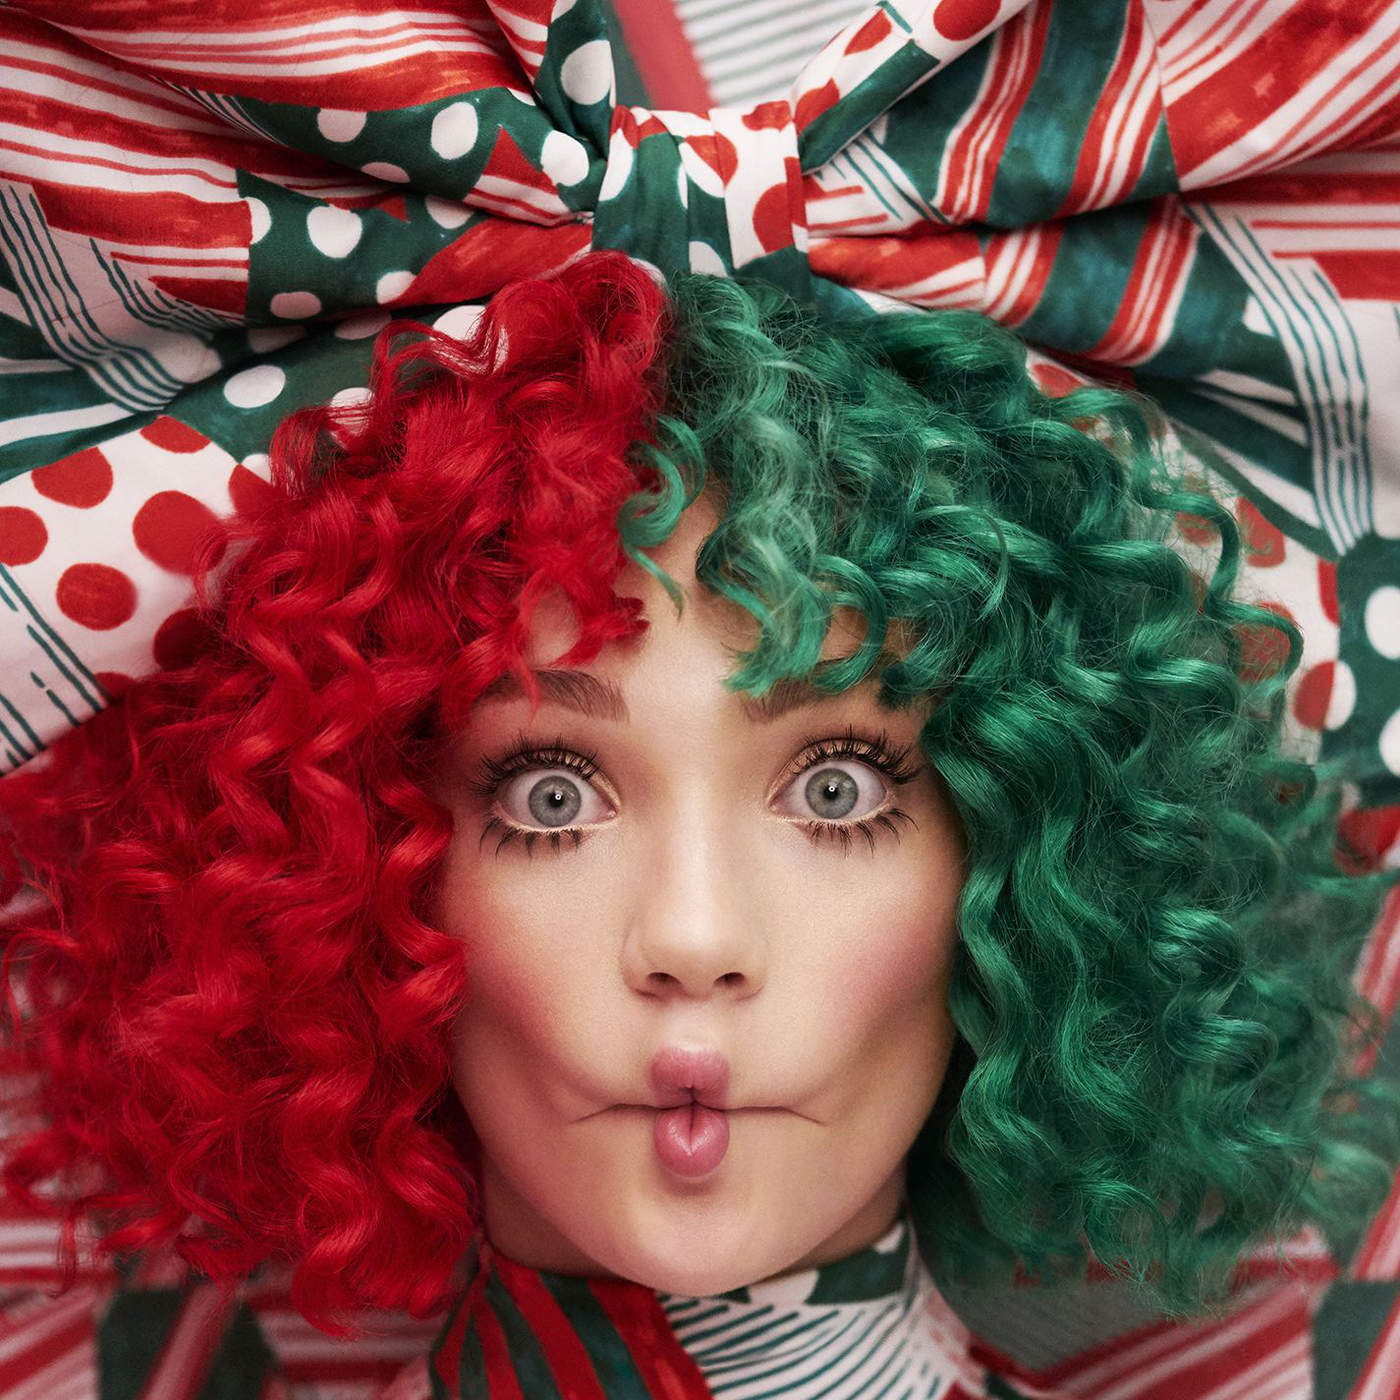 Sia - Santa's Coming For Us - Single